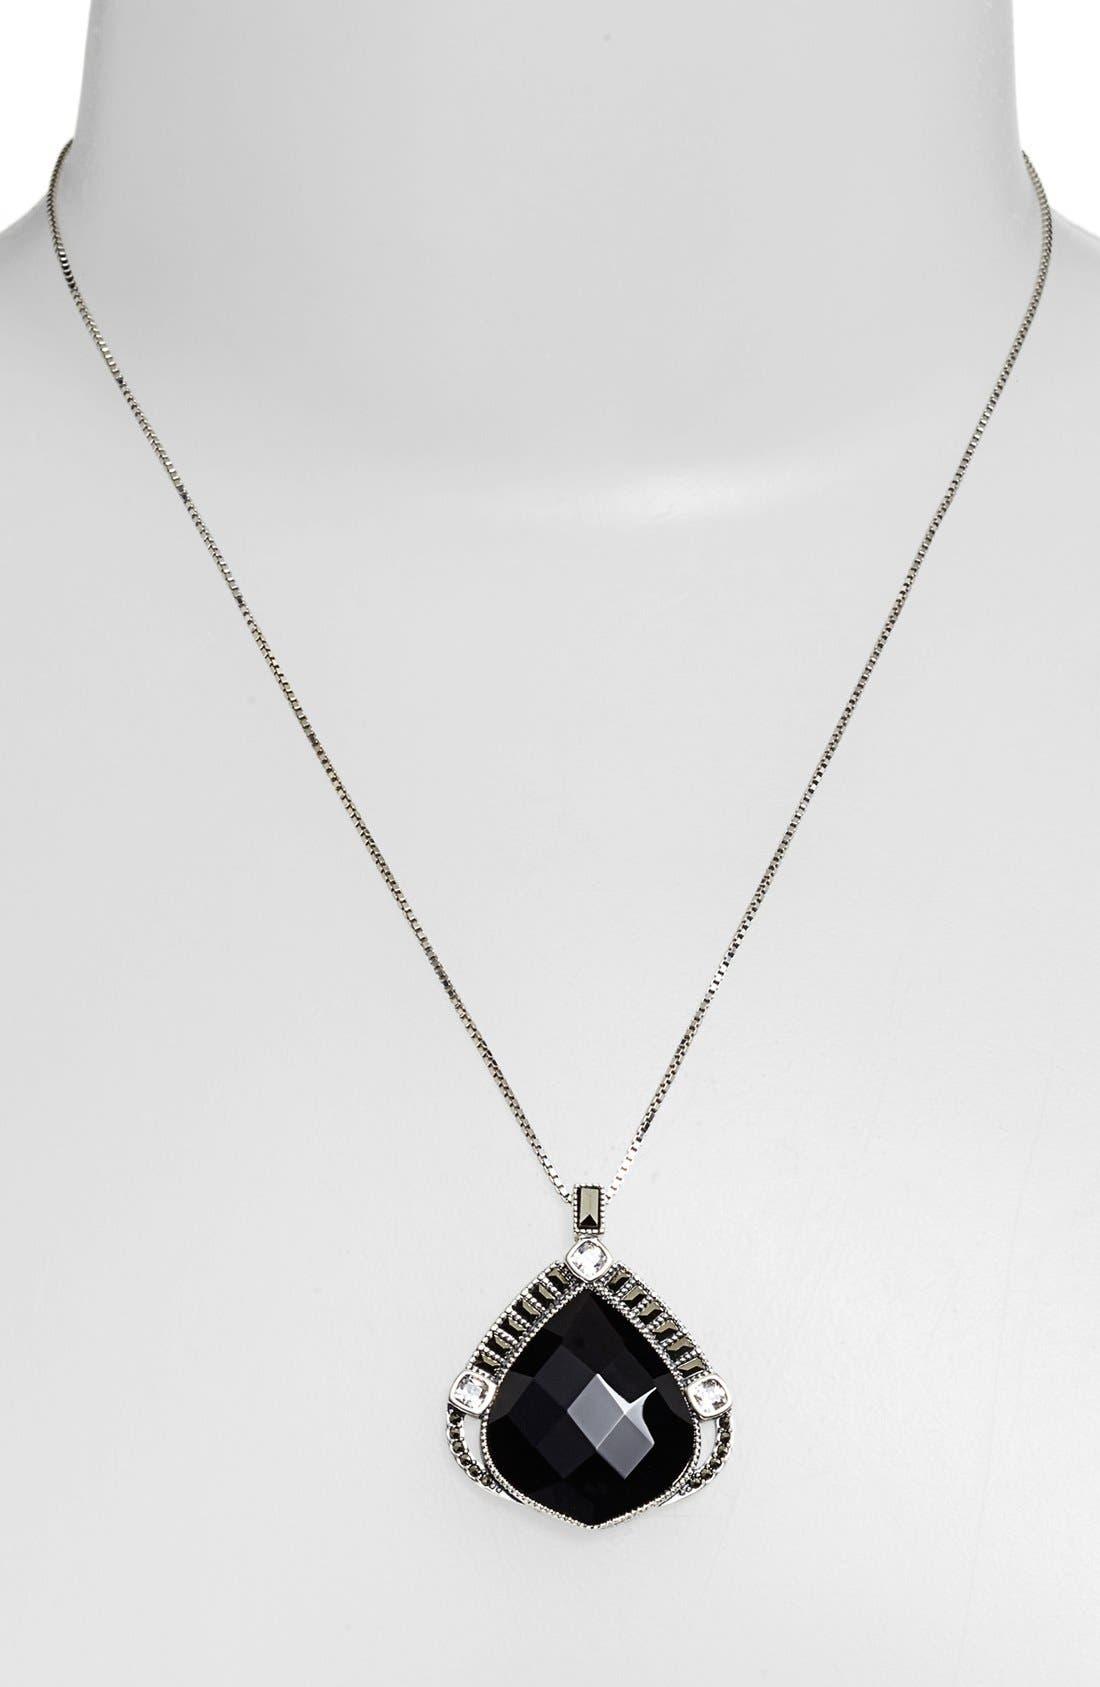 Main Image - Judith Jack 'Flamenco' Pendant Necklace